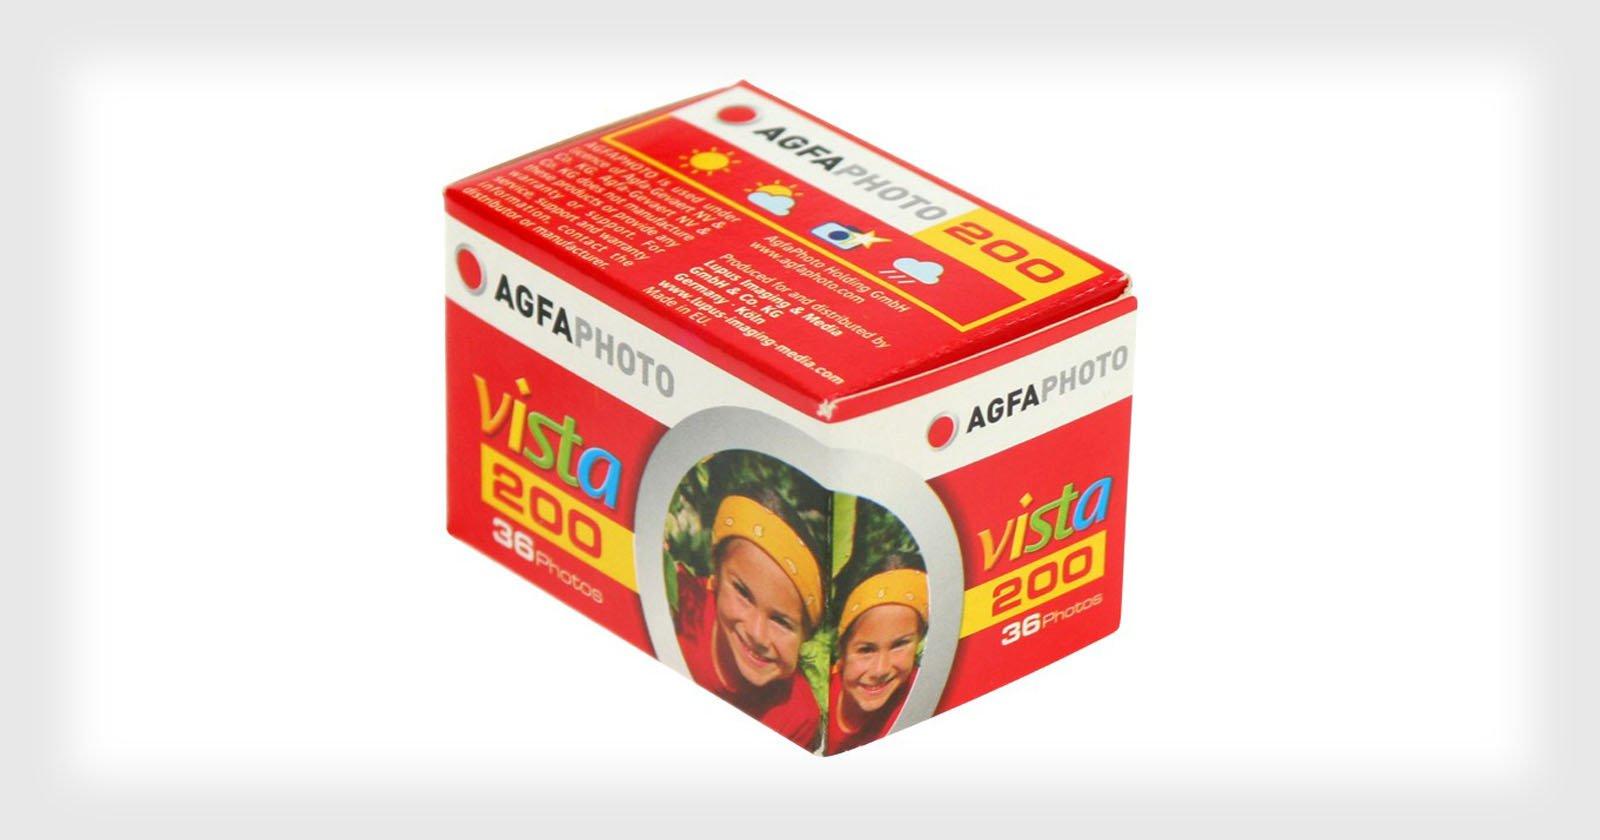 Agfa Vista Film is Dea...